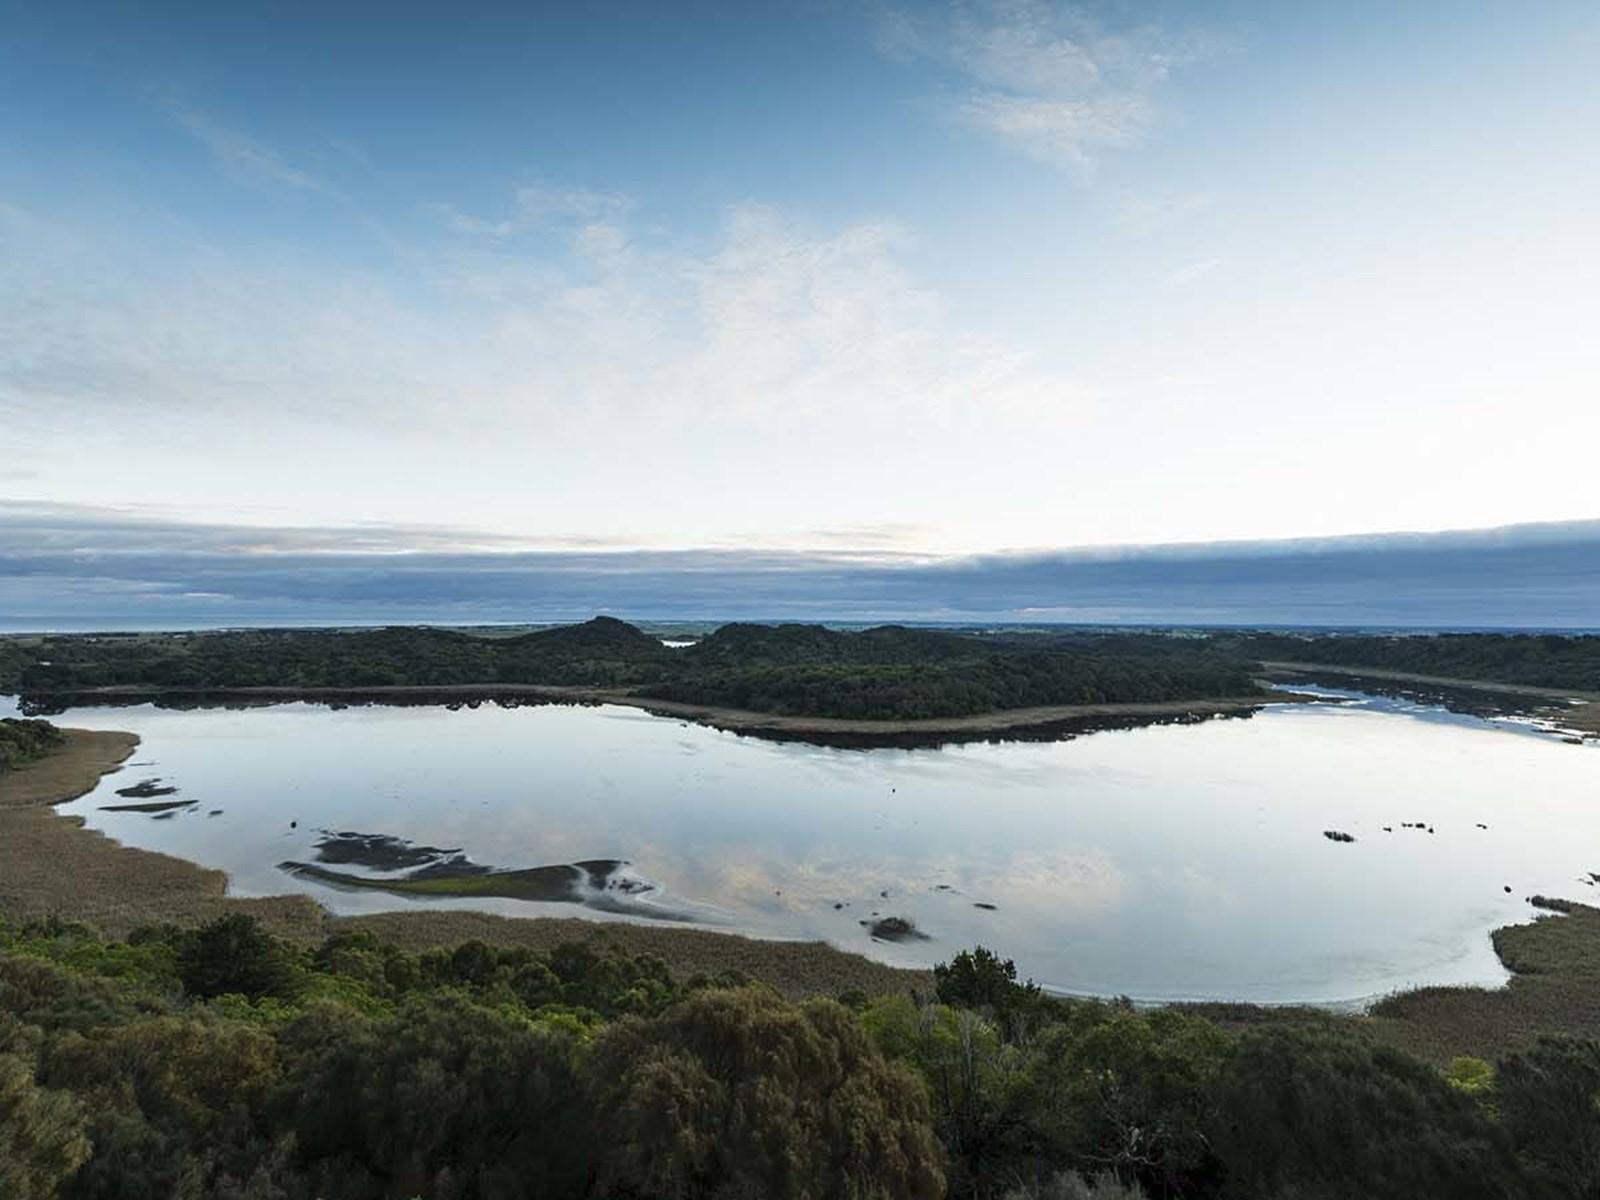 Tower Hill Wildlife Reserve, Great Ocean Road, Victoria, Australia